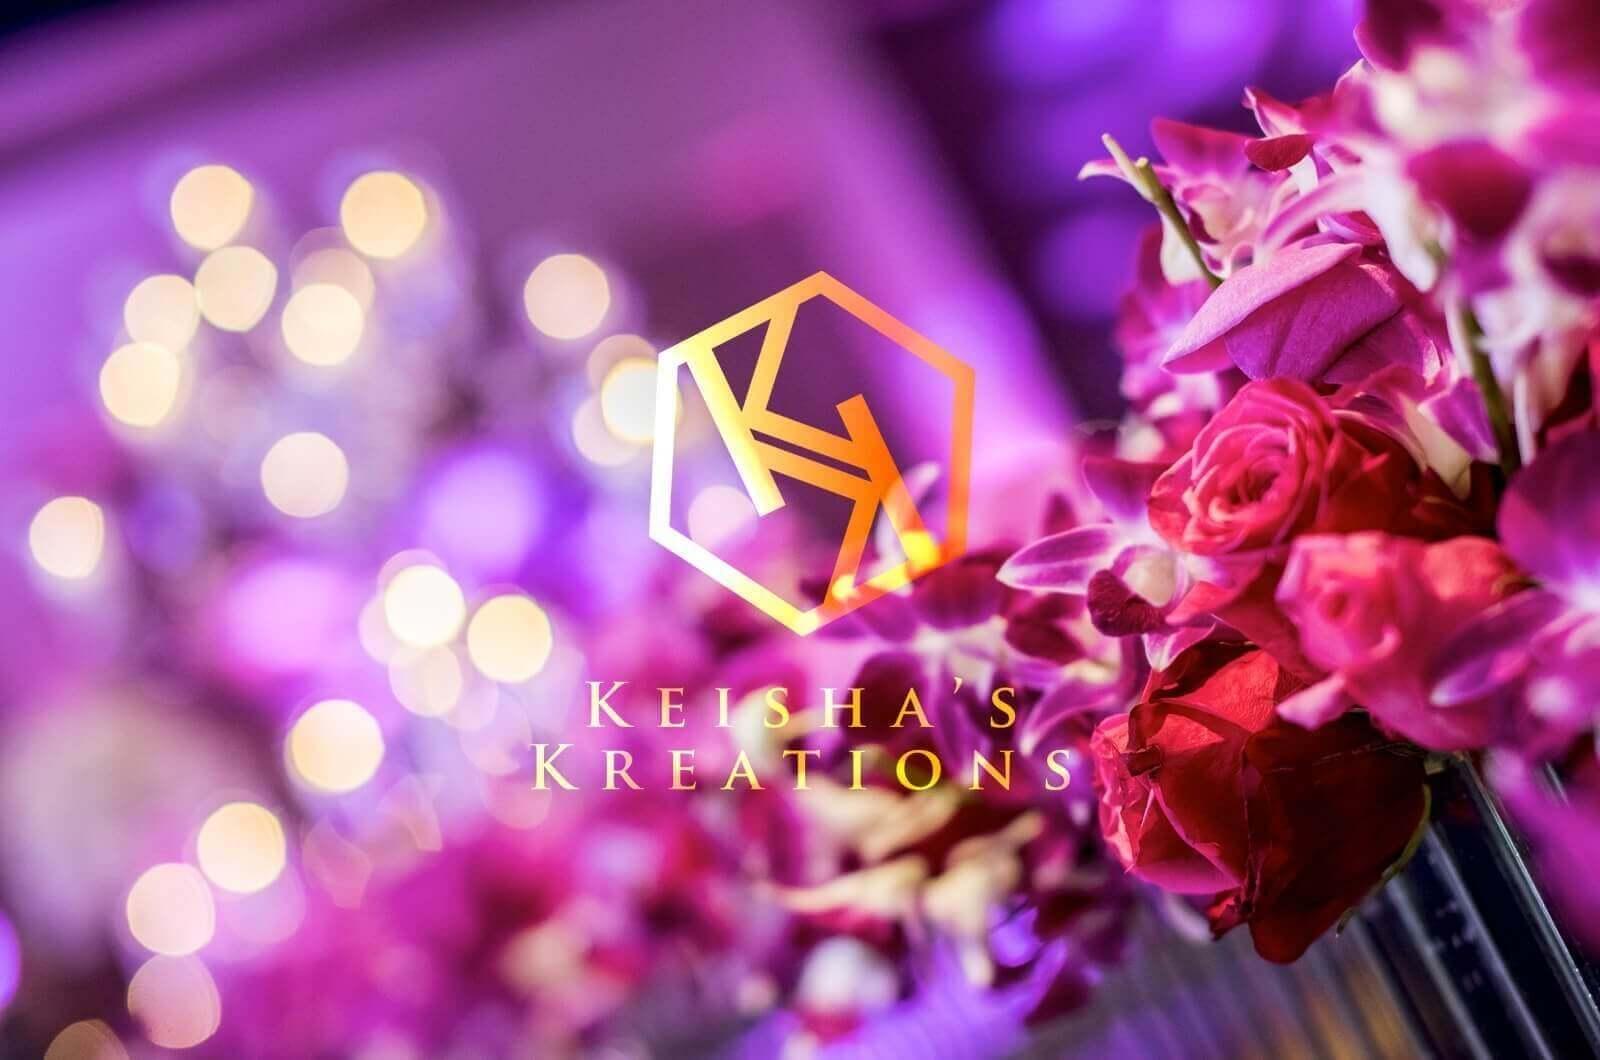 keishakreations branding